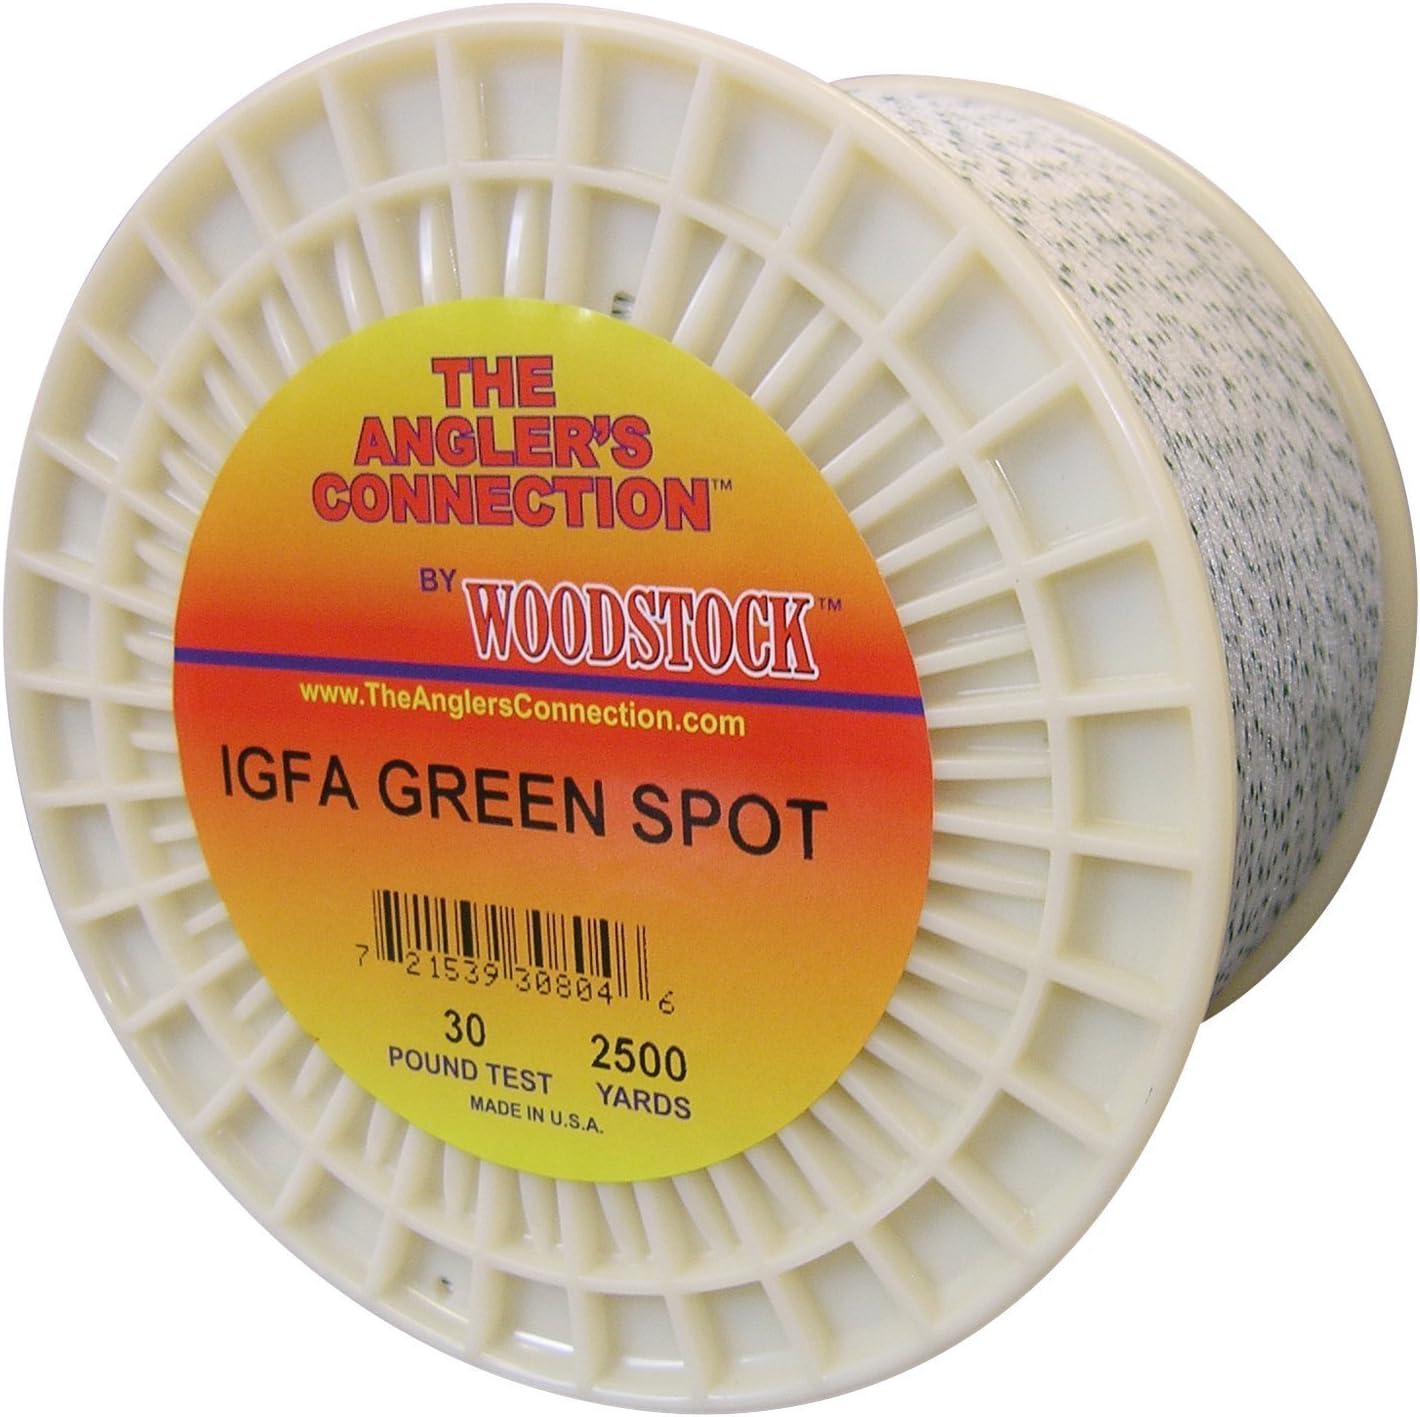 Woodstock IGFA Popular brand excellence Dacron Fishing Line Yards Test 800 80# GreenSpo